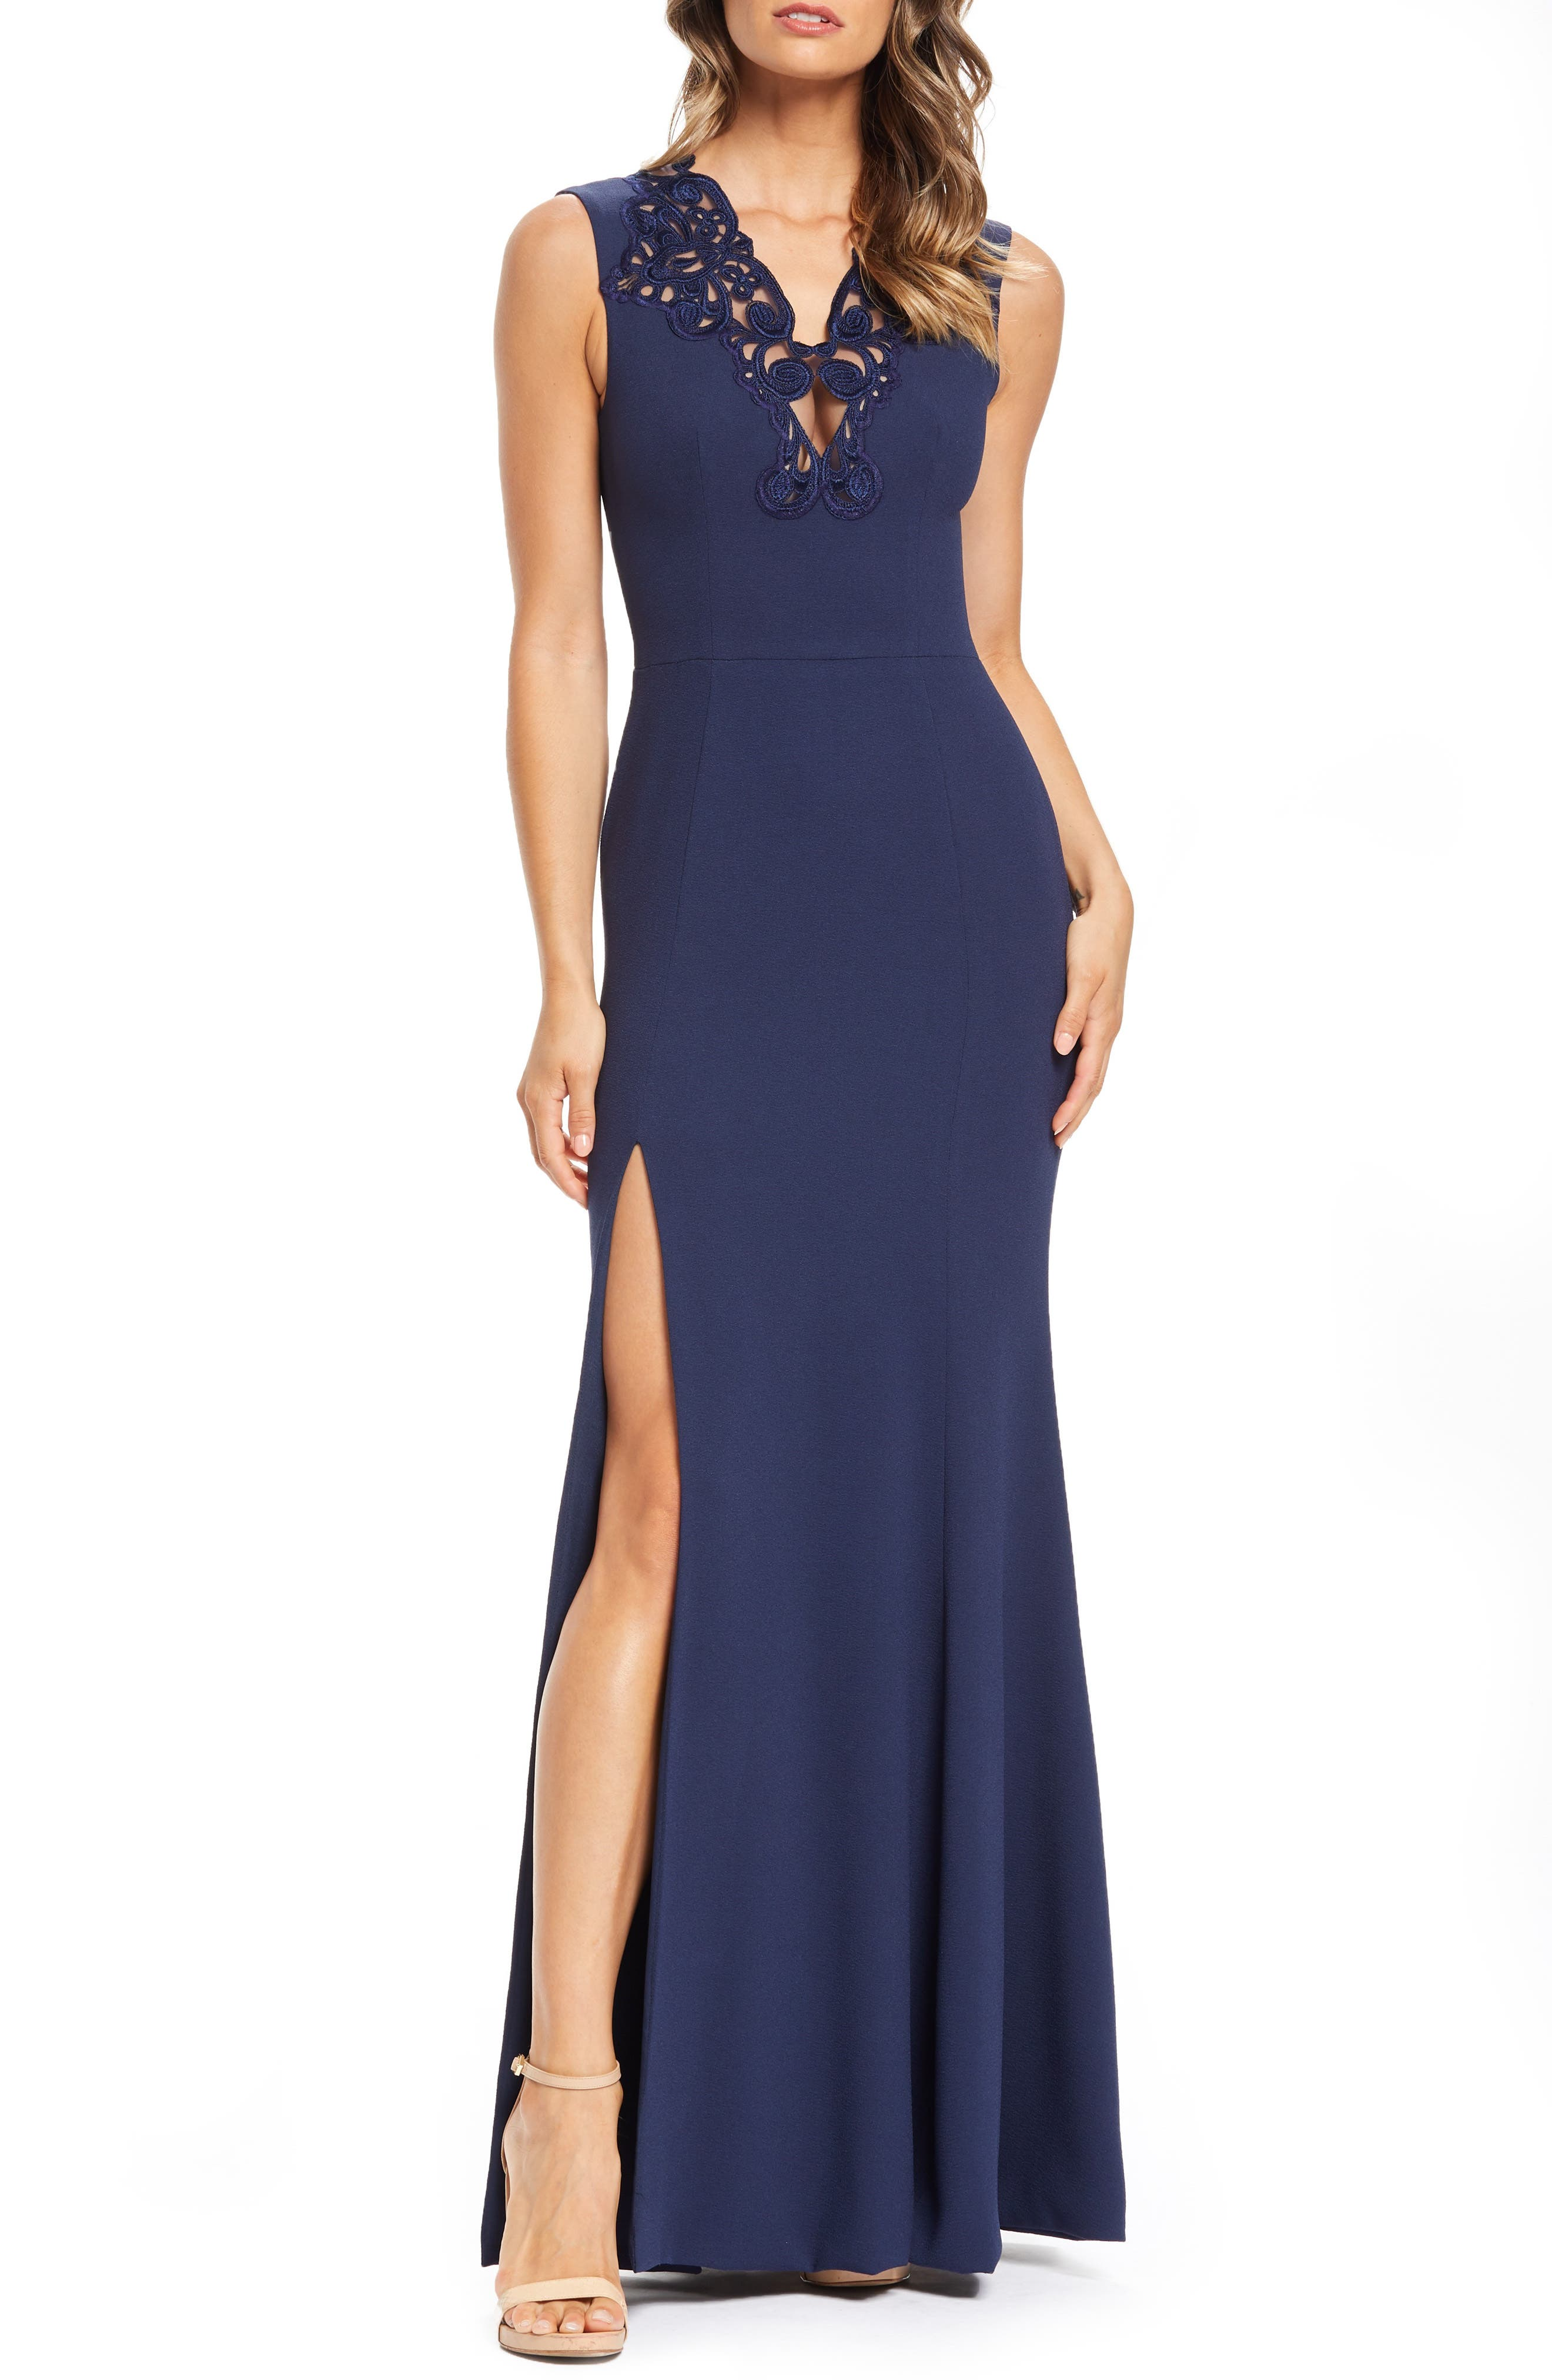 Dress The Population Cassandra Embroidered Evening Dress, Blue